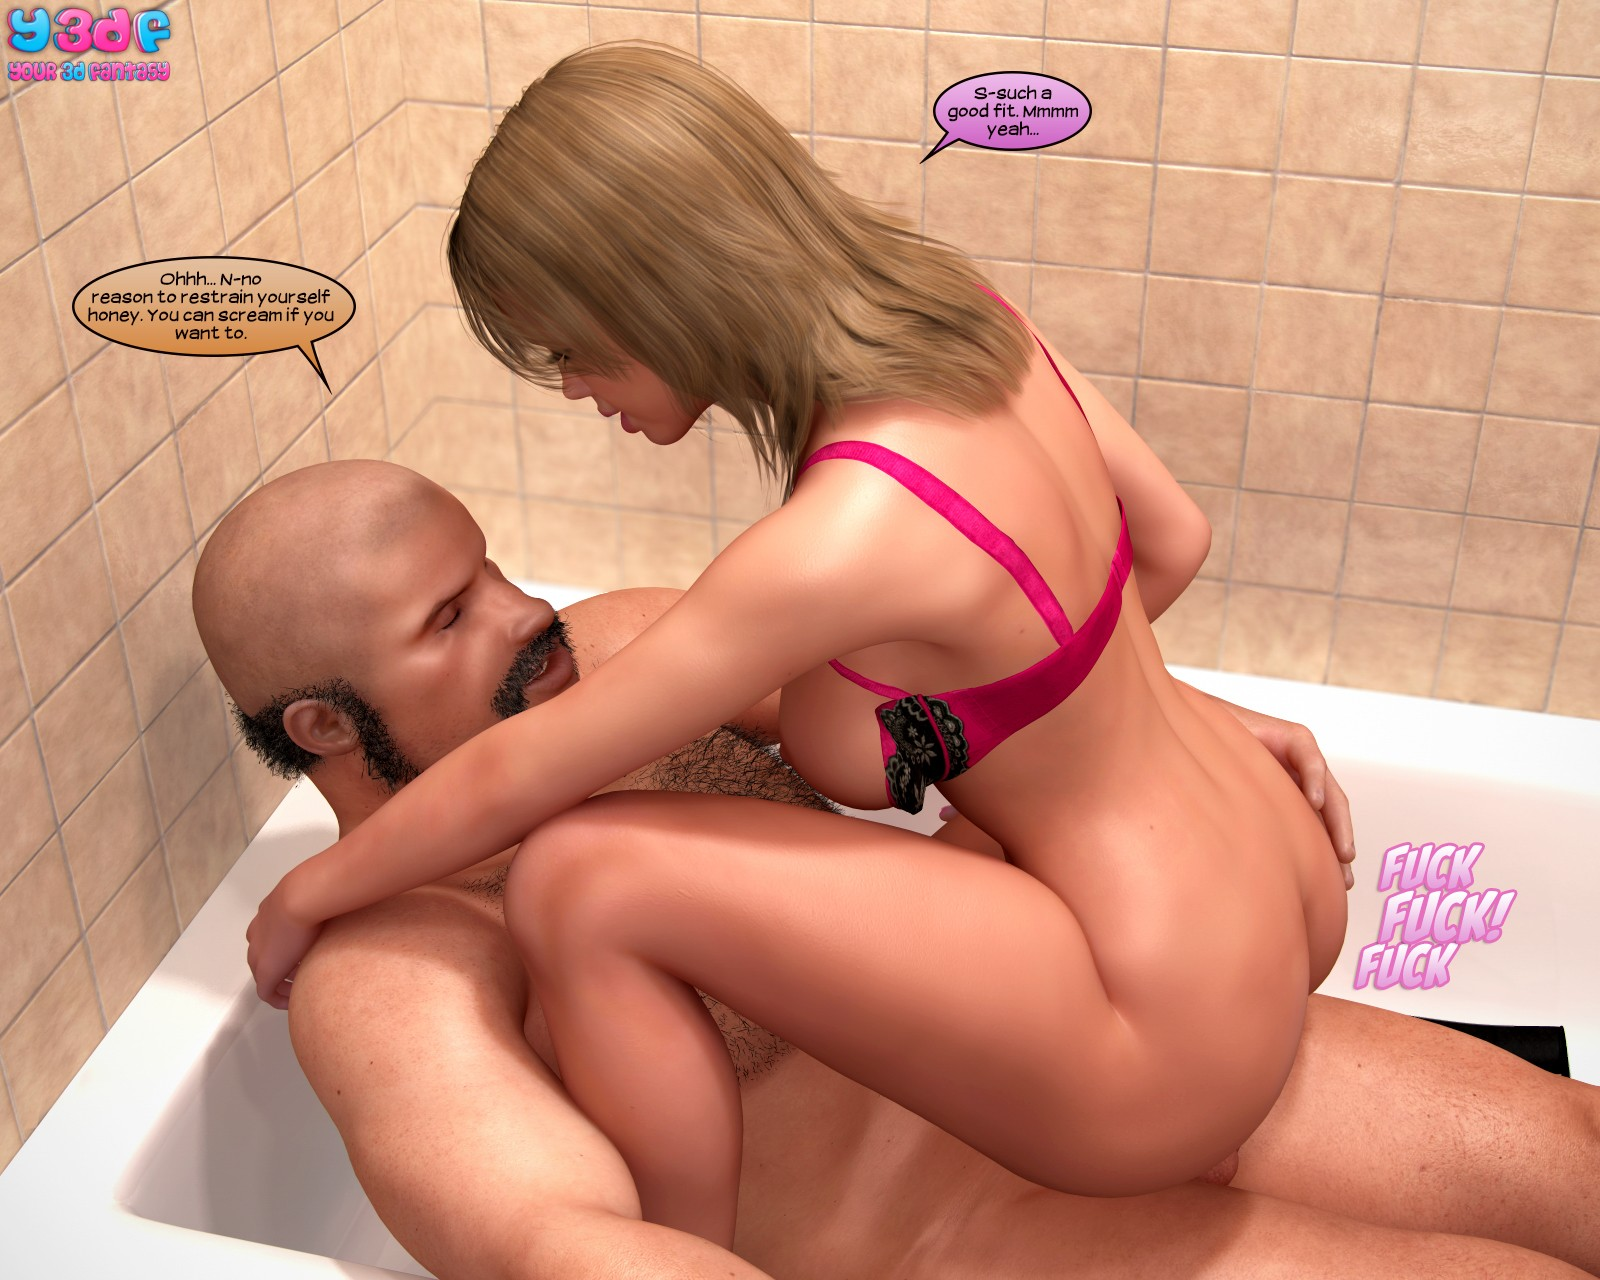 3d comic slut wife invites boss home cuckold watches part 3 6